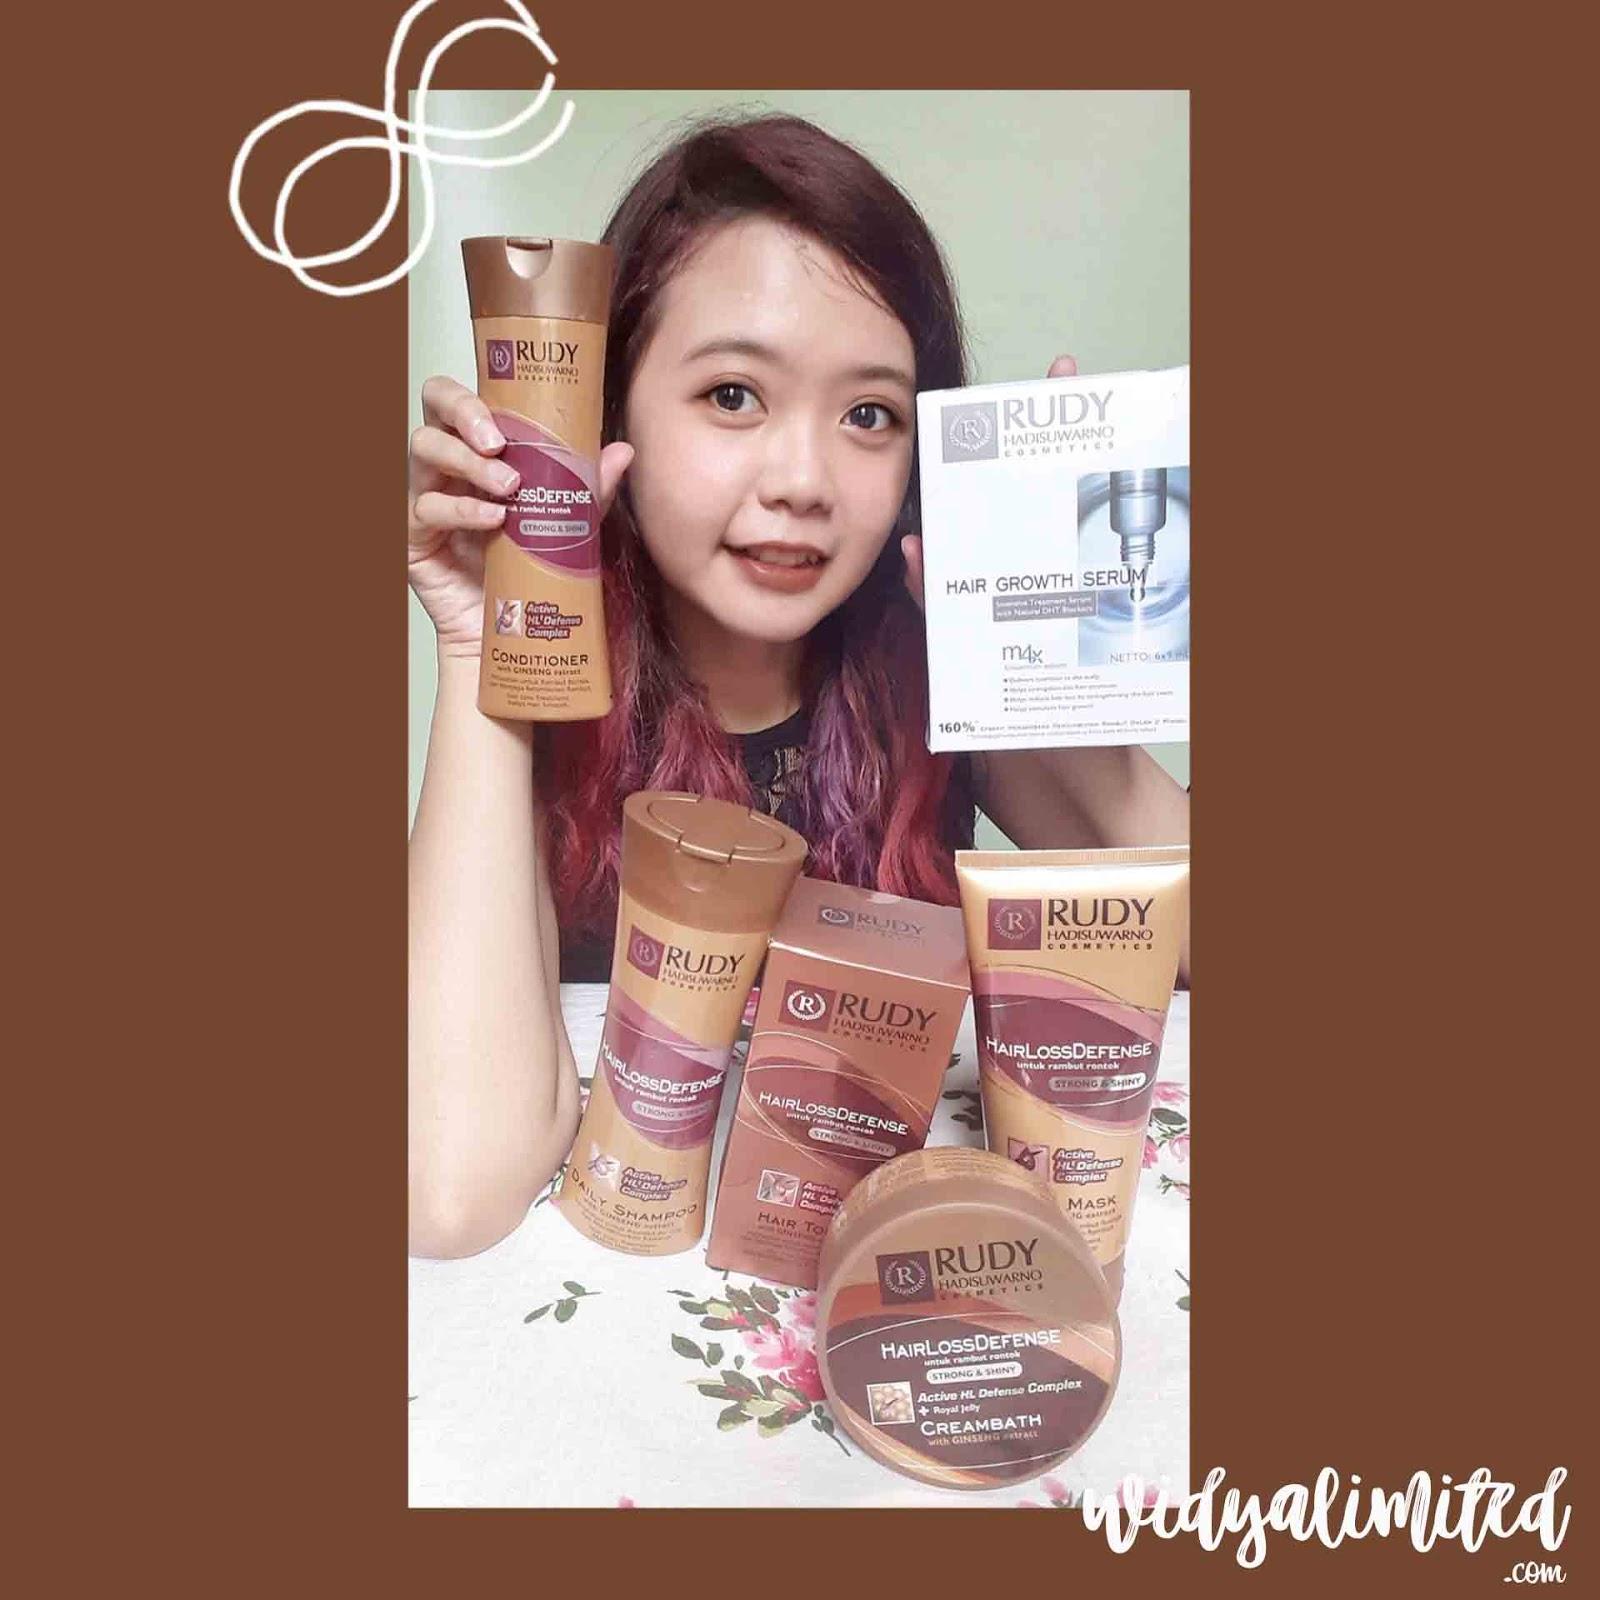 Honest Review Cara Mengatasi Rambut Rontok Dengan Rudy Hadisuwarno Hair Loss Defense Treatment Bahasa Indonesia Widyalimited